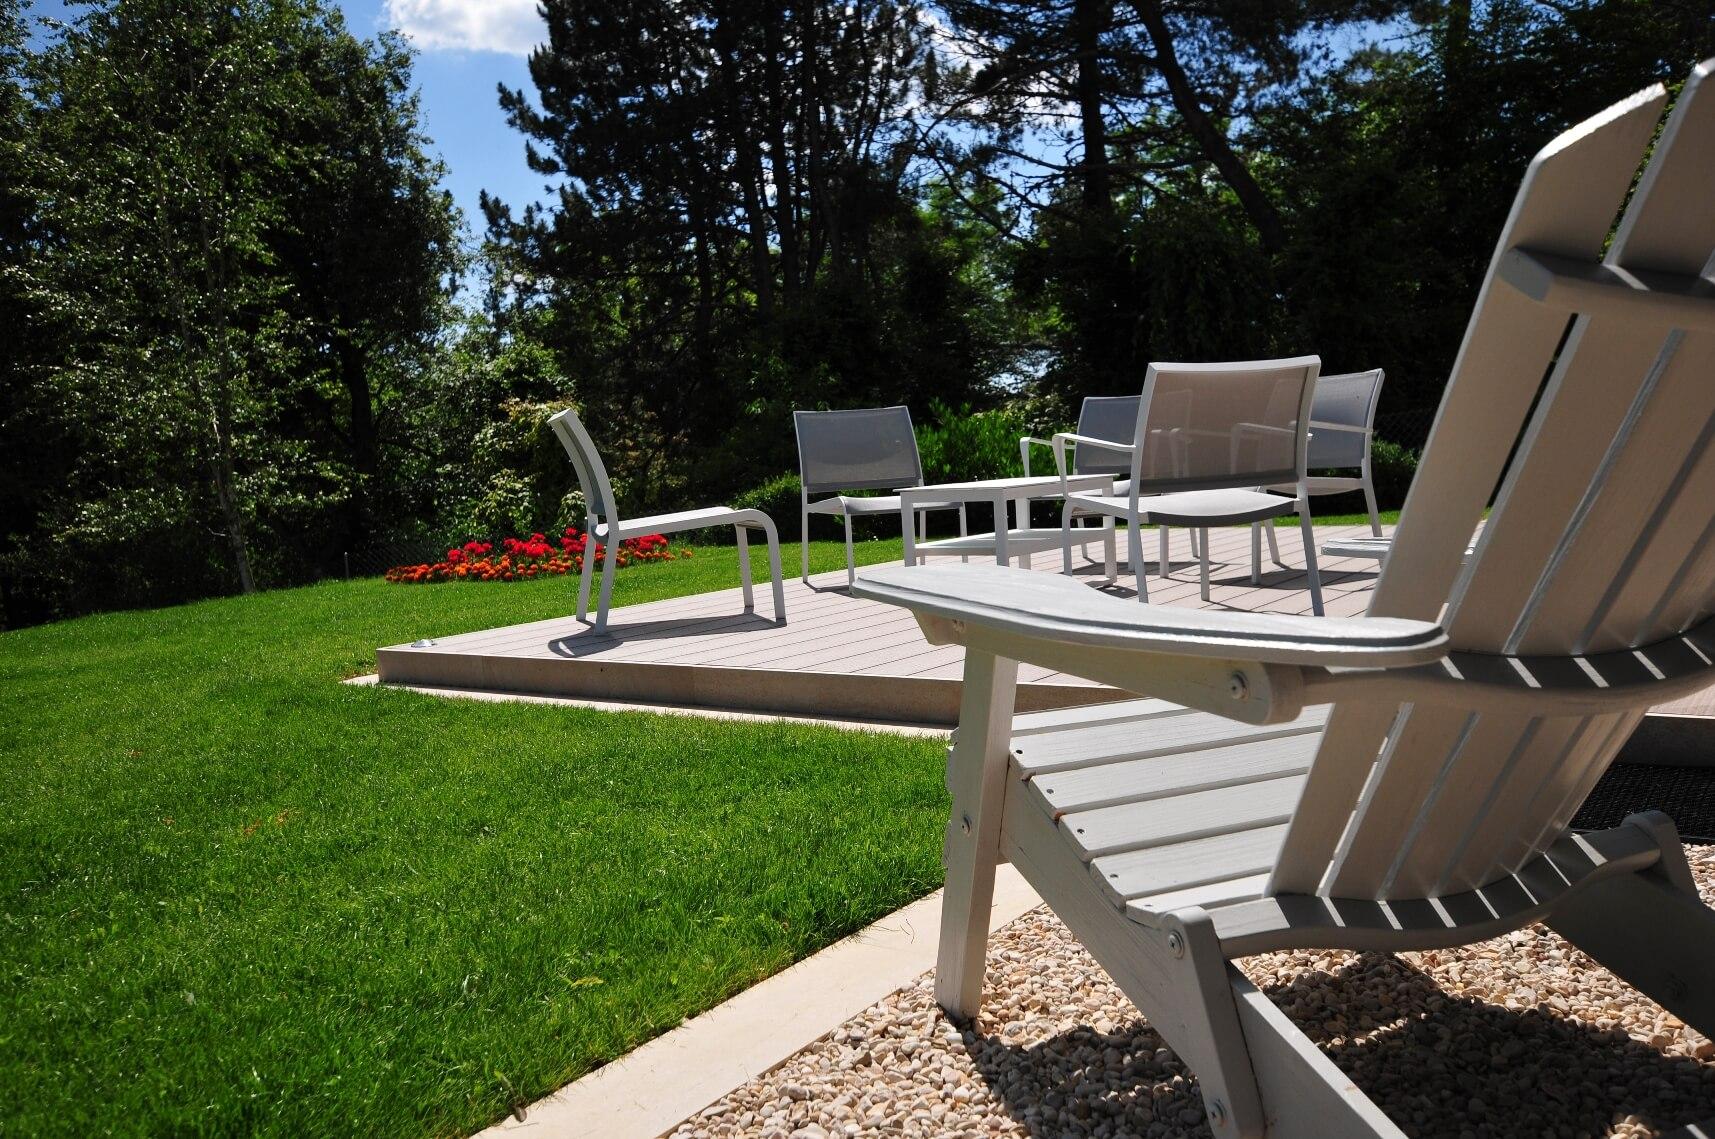 paysagiste tramelan villa terrasse jardin mur en pierres calcaires aellig paysages (12)